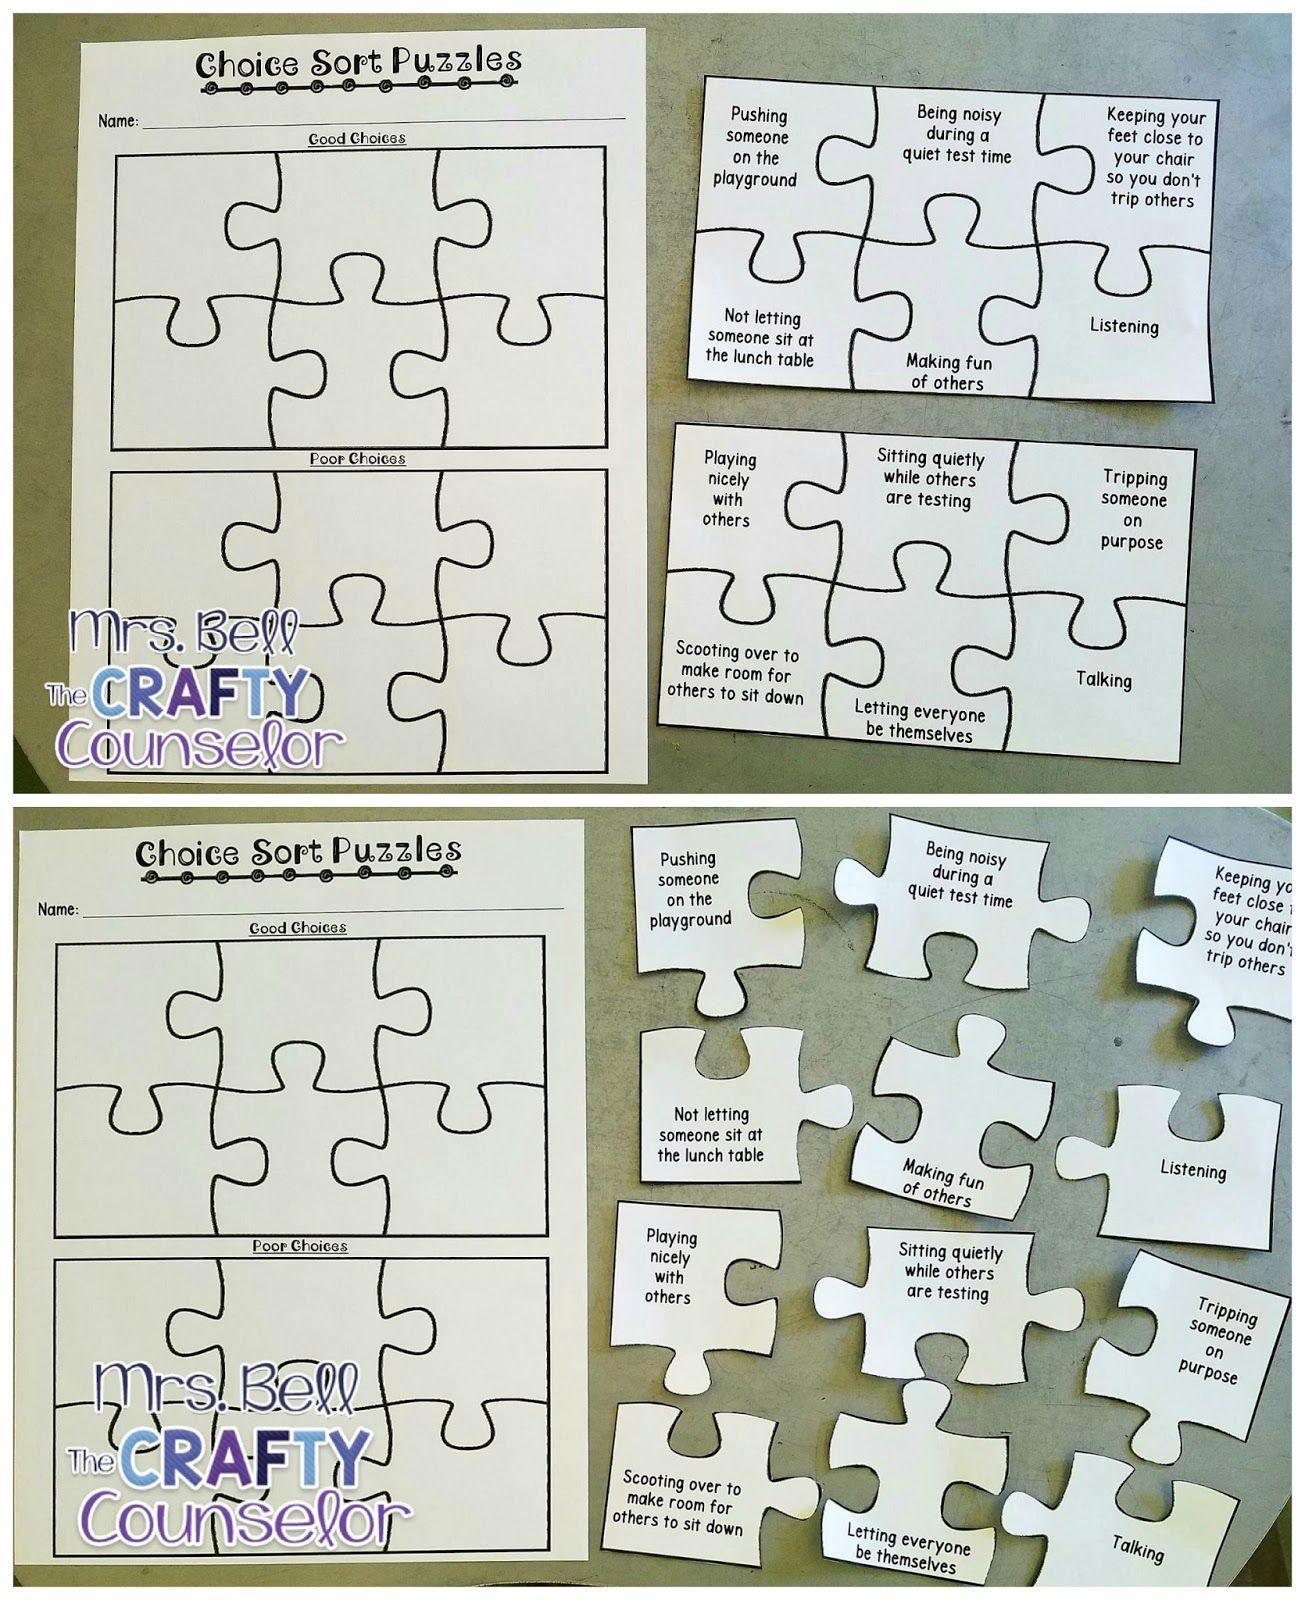 Good Choice Vs Poor Choice Puzzles